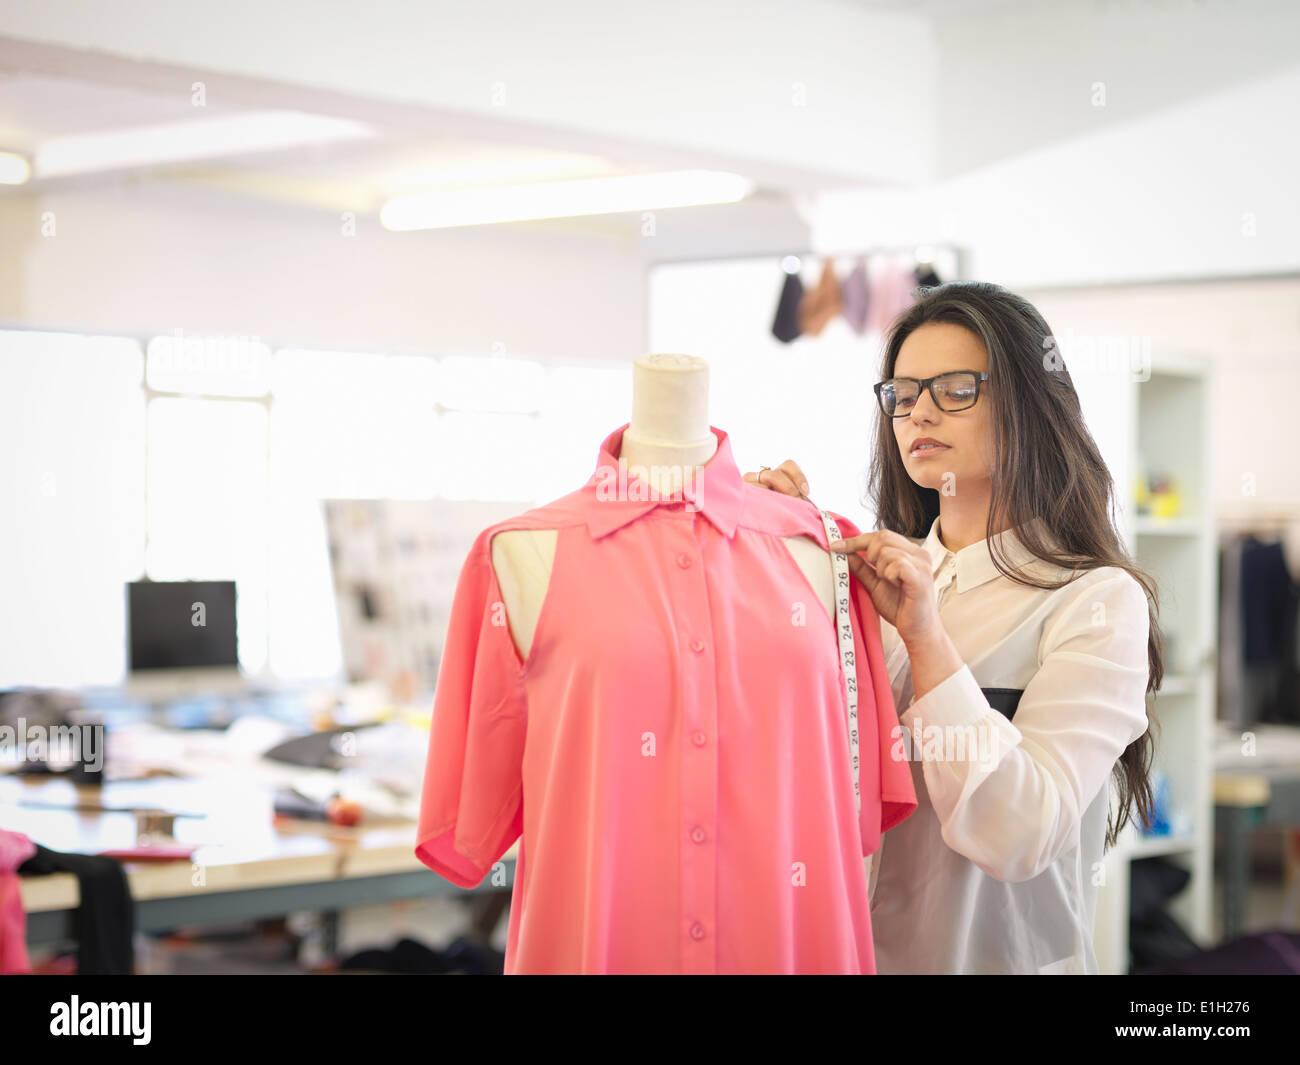 Fashion designer measuring garment in fashion design studio - Stock Image